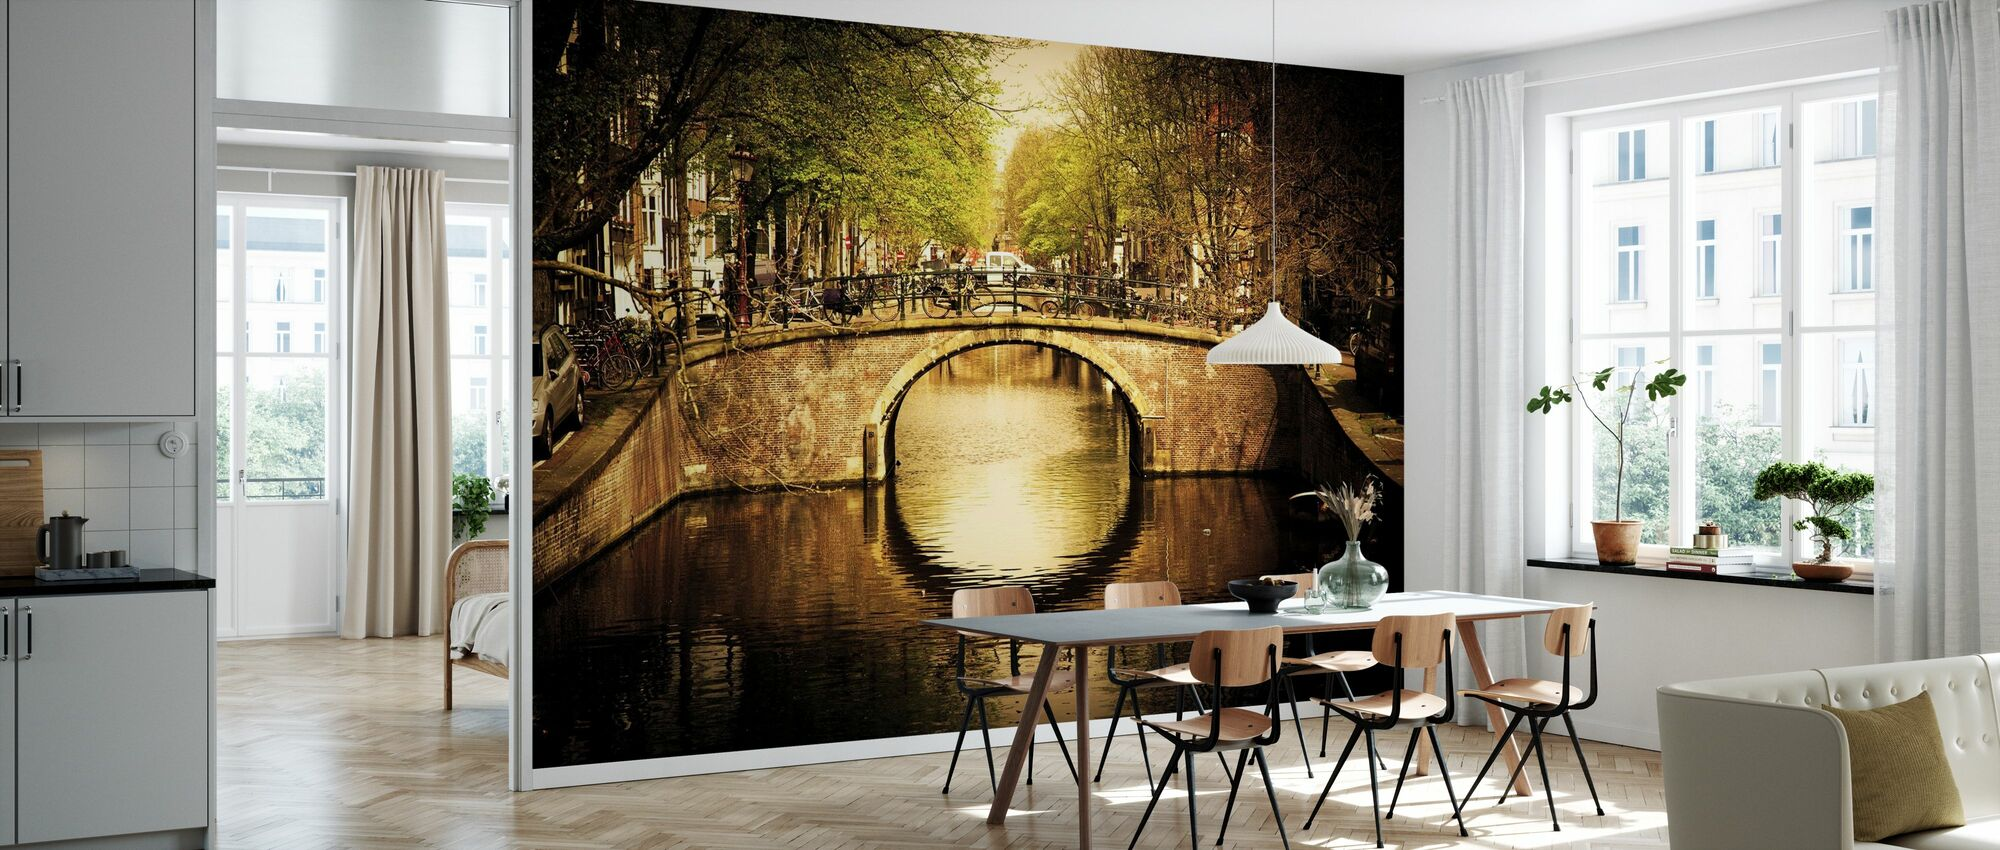 Romantic Bridge Over Canal in Amsterdam - Wallpaper - Kitchen